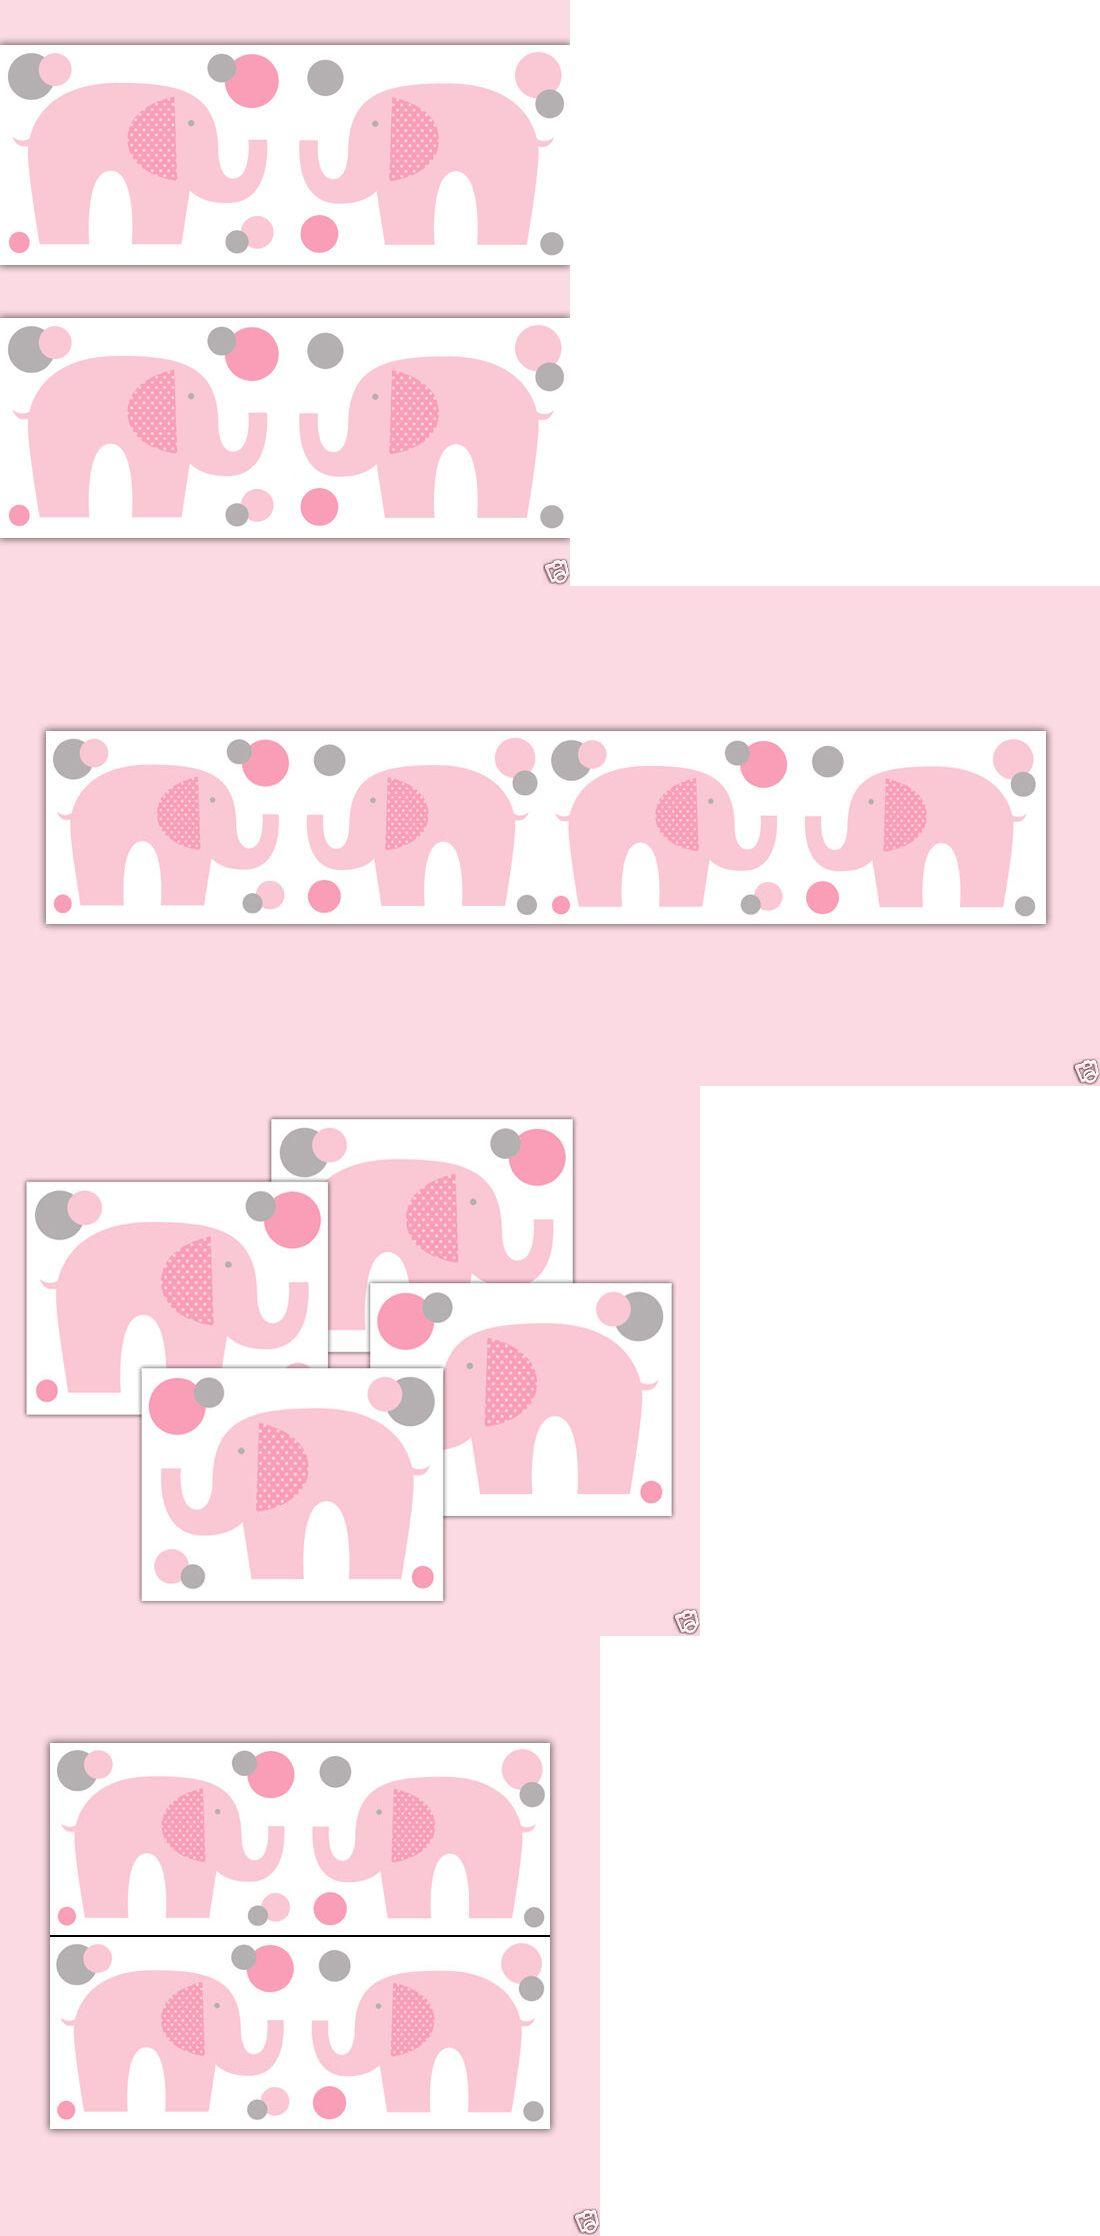 Wallpaper Borders 37636 Elephant Wallpaper Border Nursery Decal Pink Grey Gray Girl Baby Room Wall Art Buy It Now Only 12 5 On Ebay Wallpaper Borders